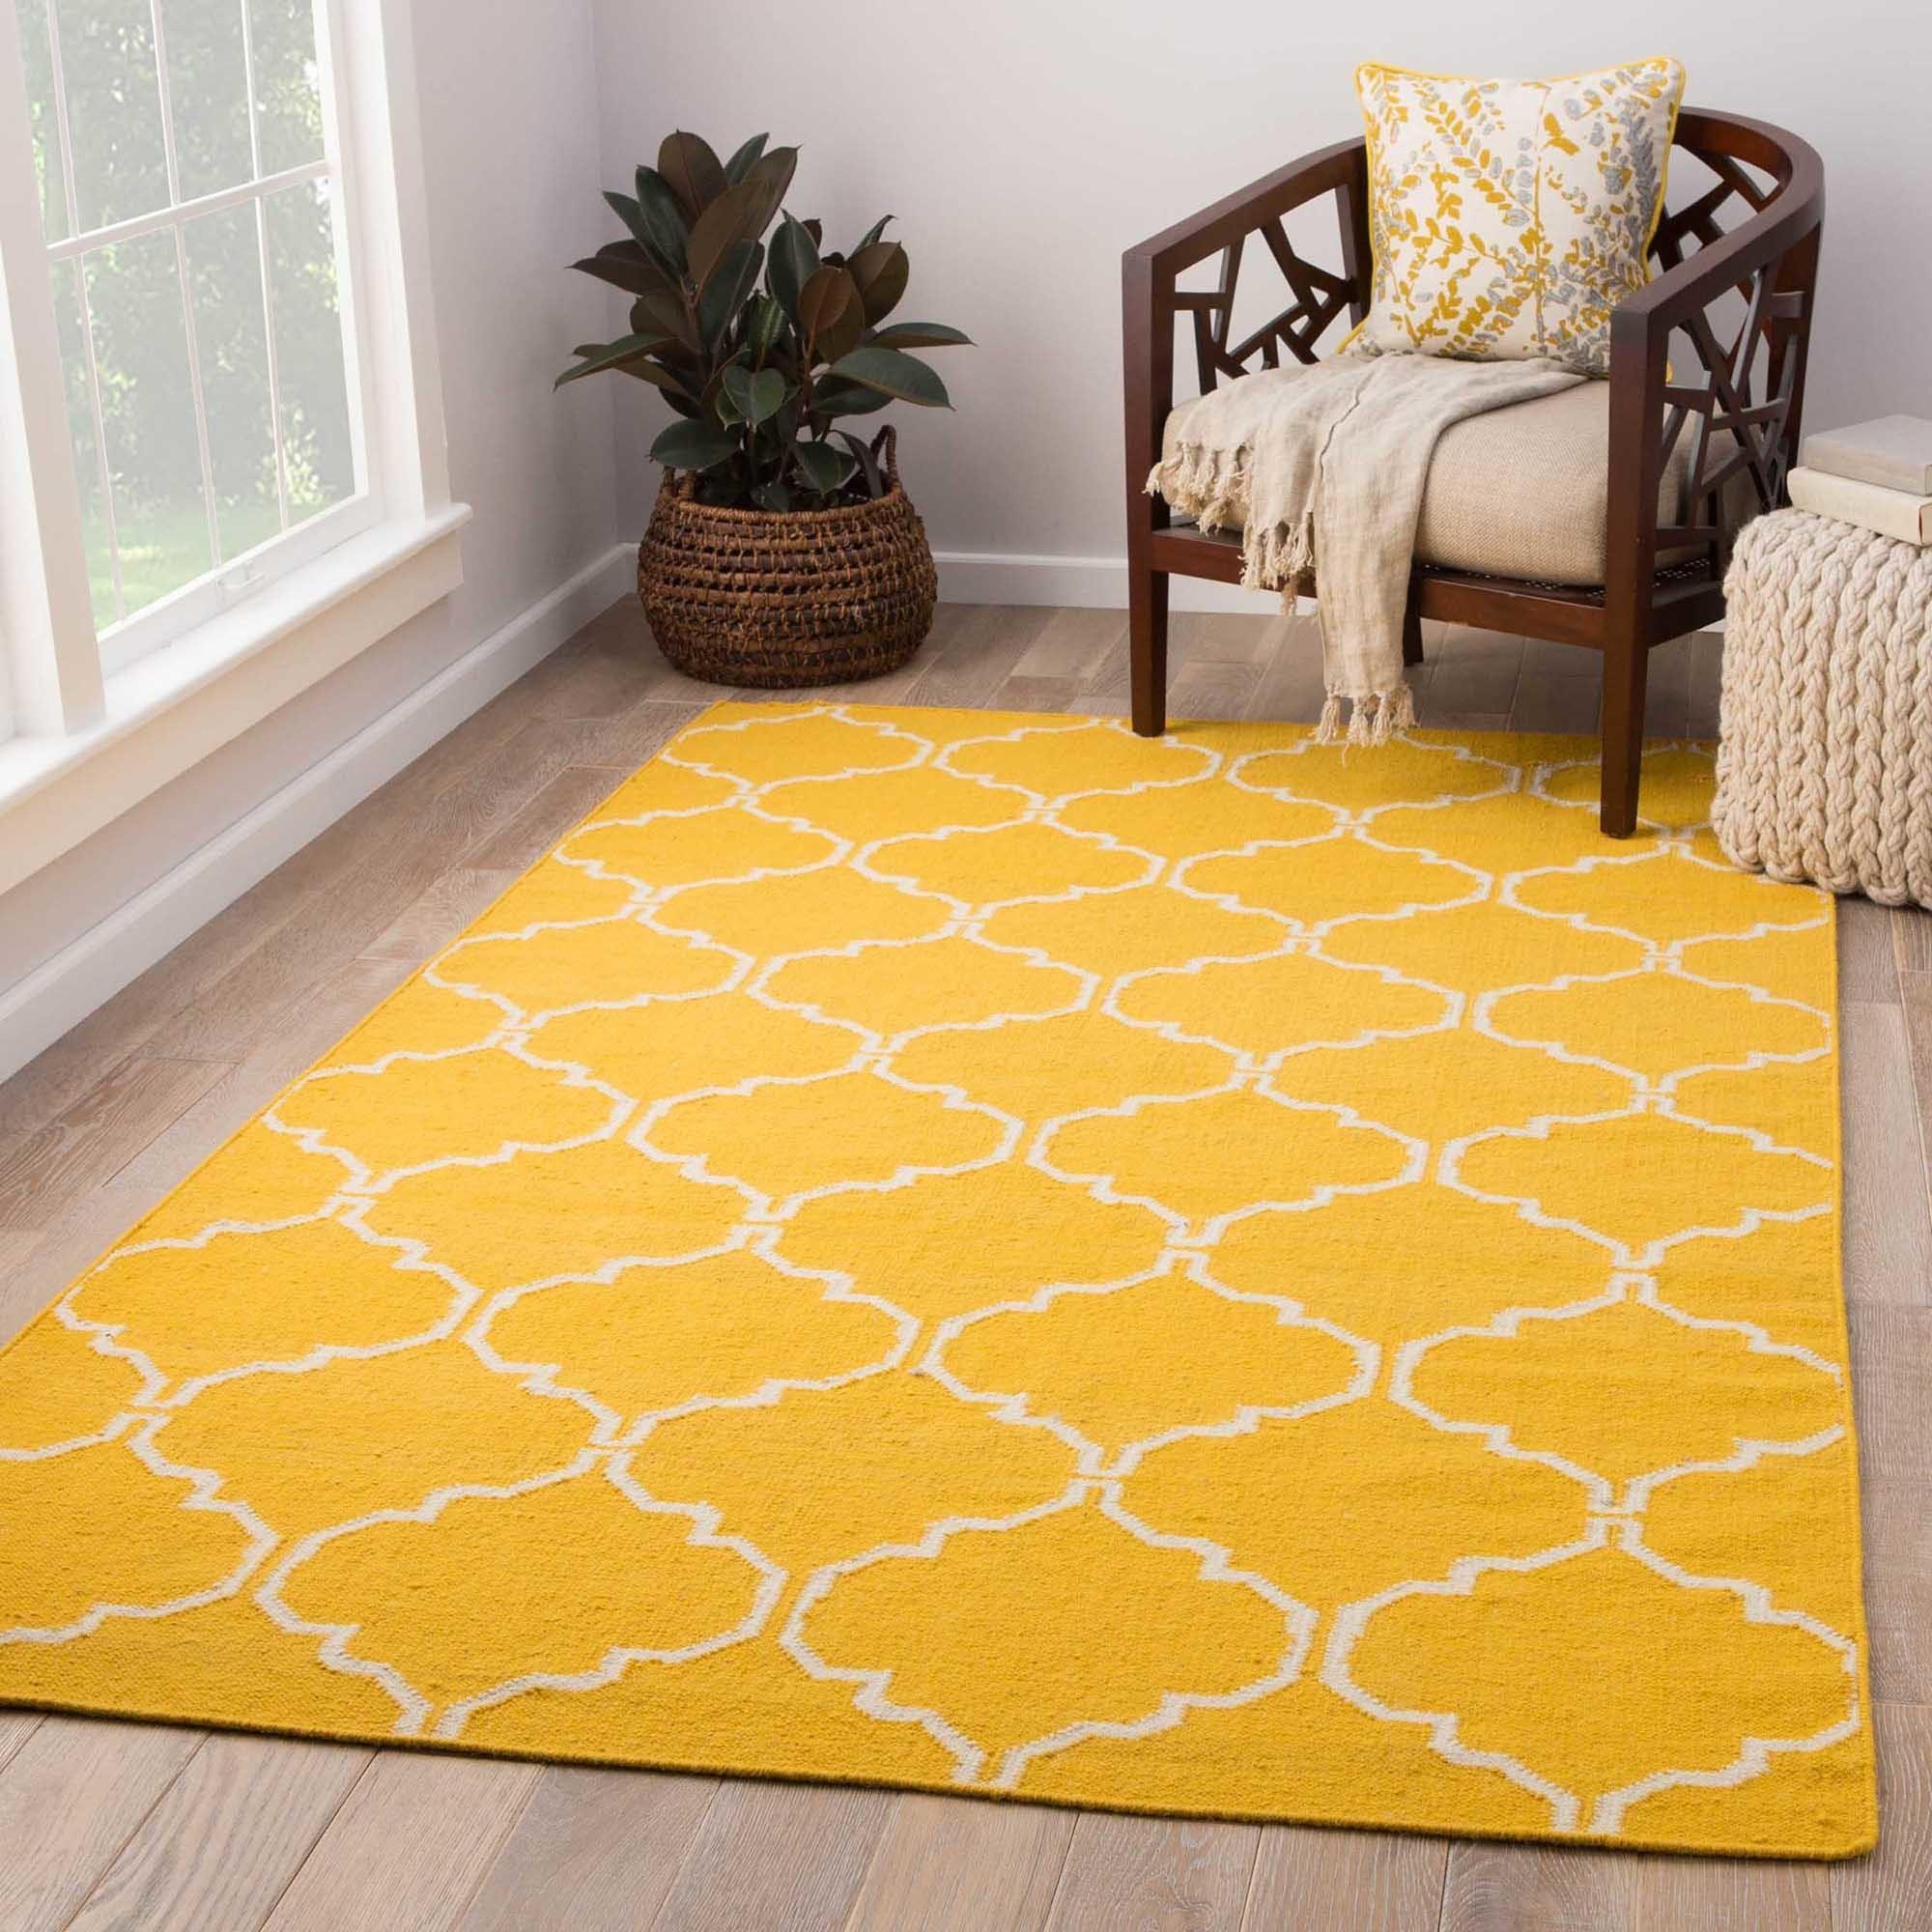 Juniper Home Lark Handmade Trellis Yellow/ White Area Rug...